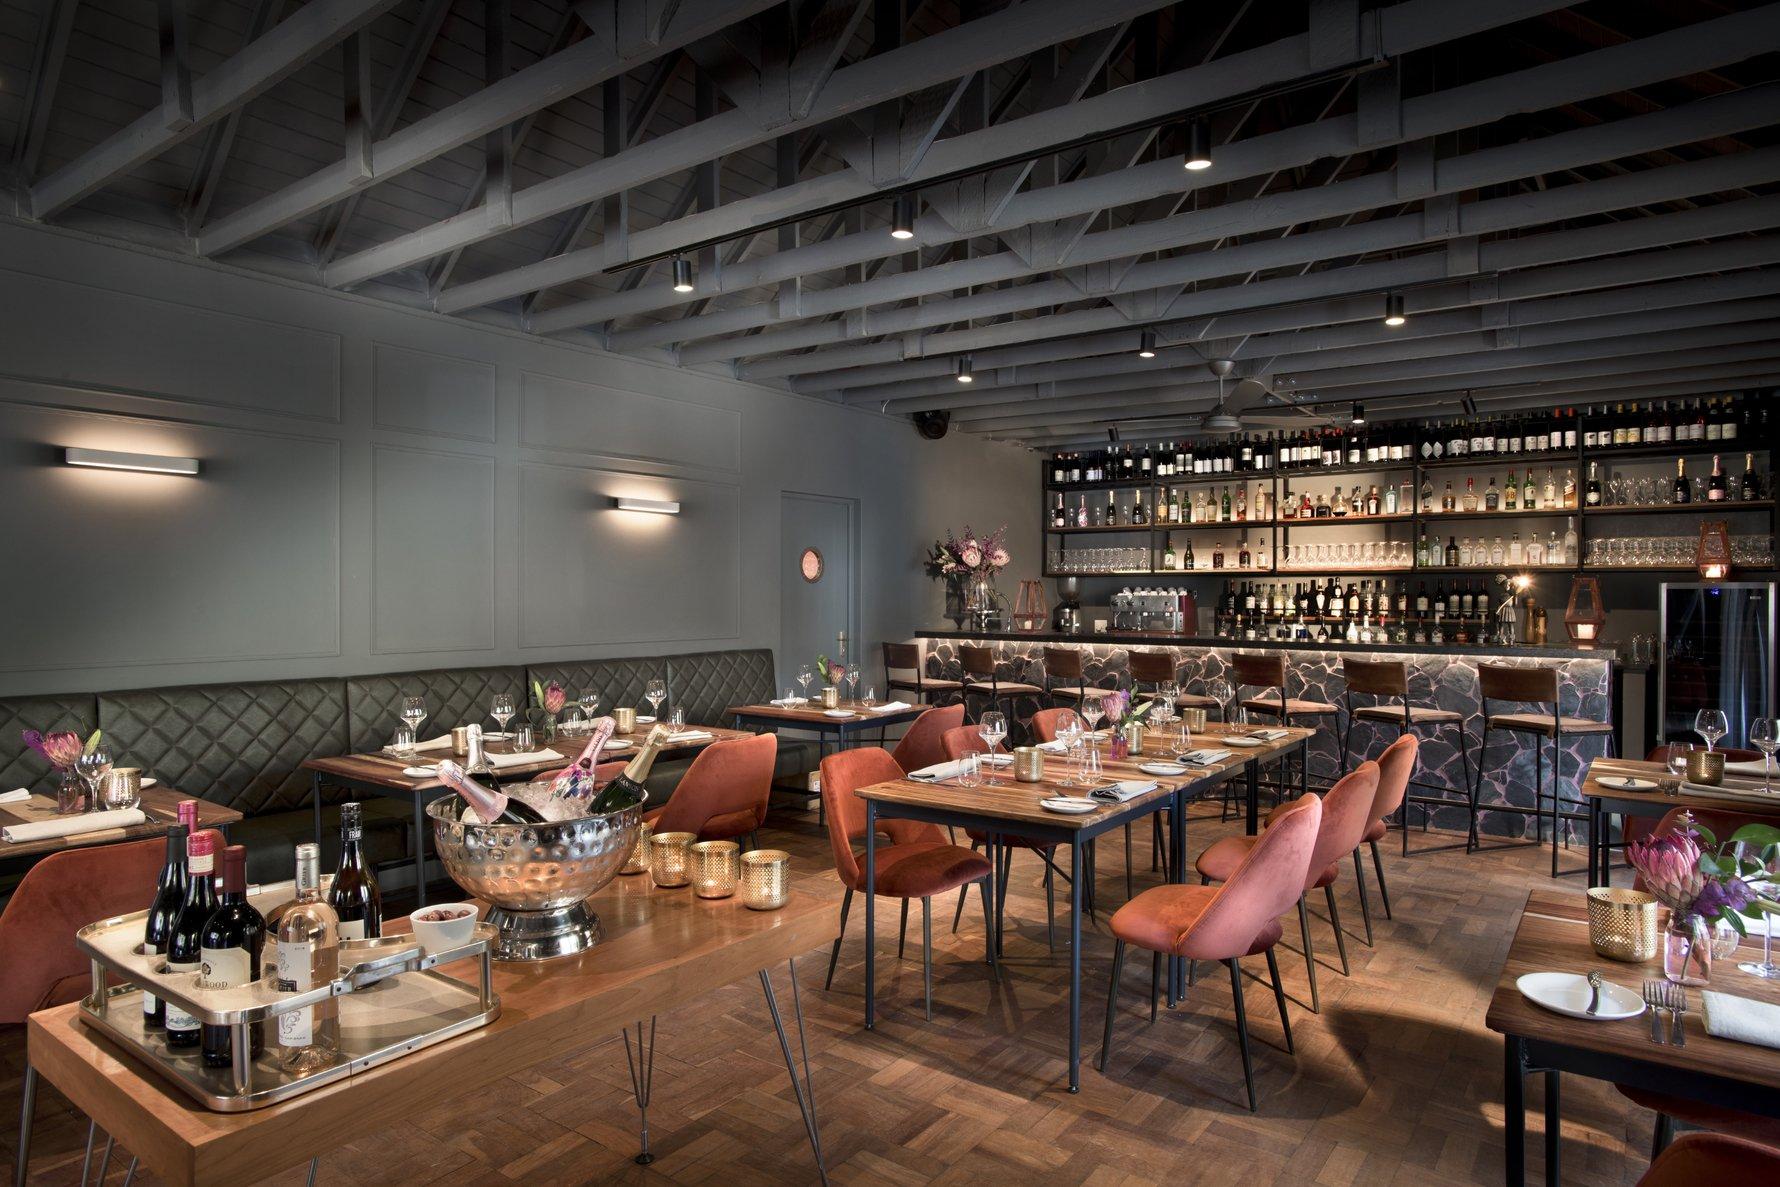 Basalt Restaurant at Peech Hotel